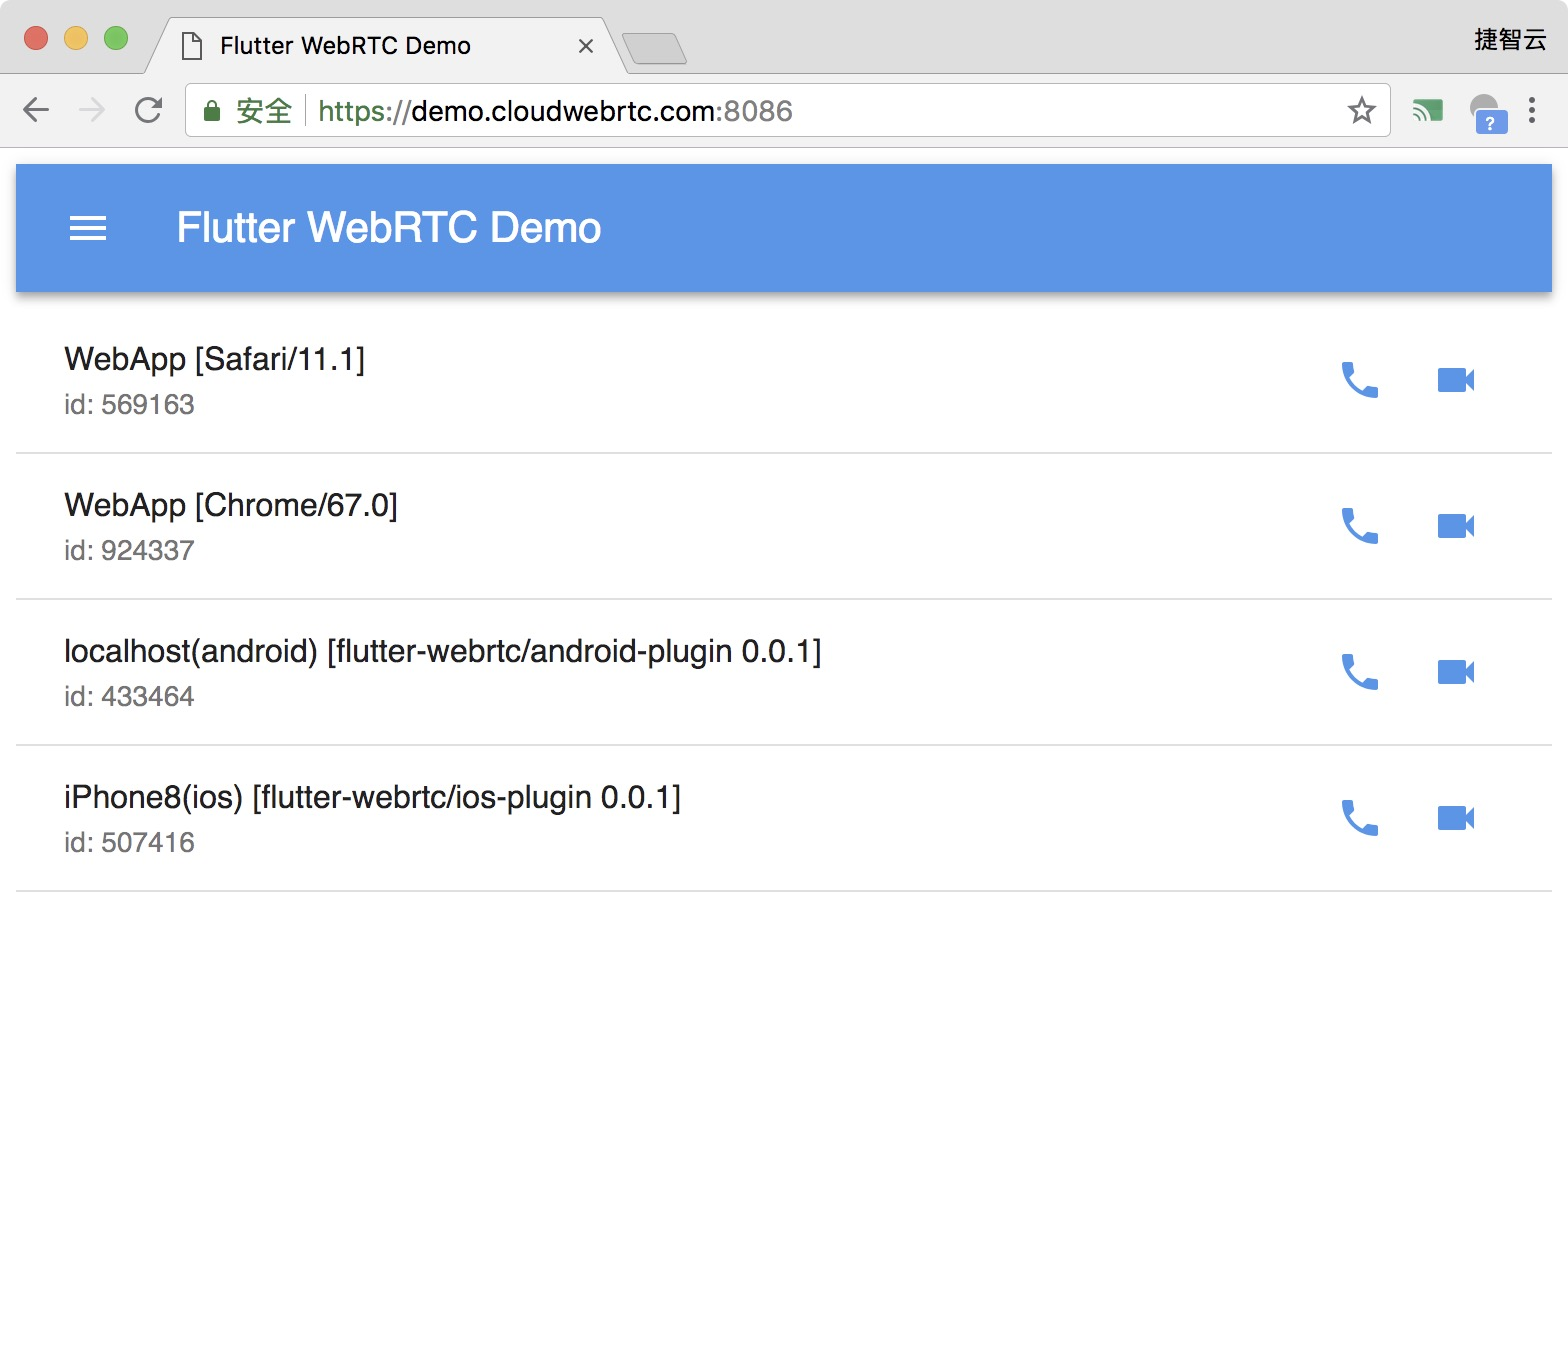 GitHub - cloudwebrtc/flutter-webrtc-server: A simple WebRTC